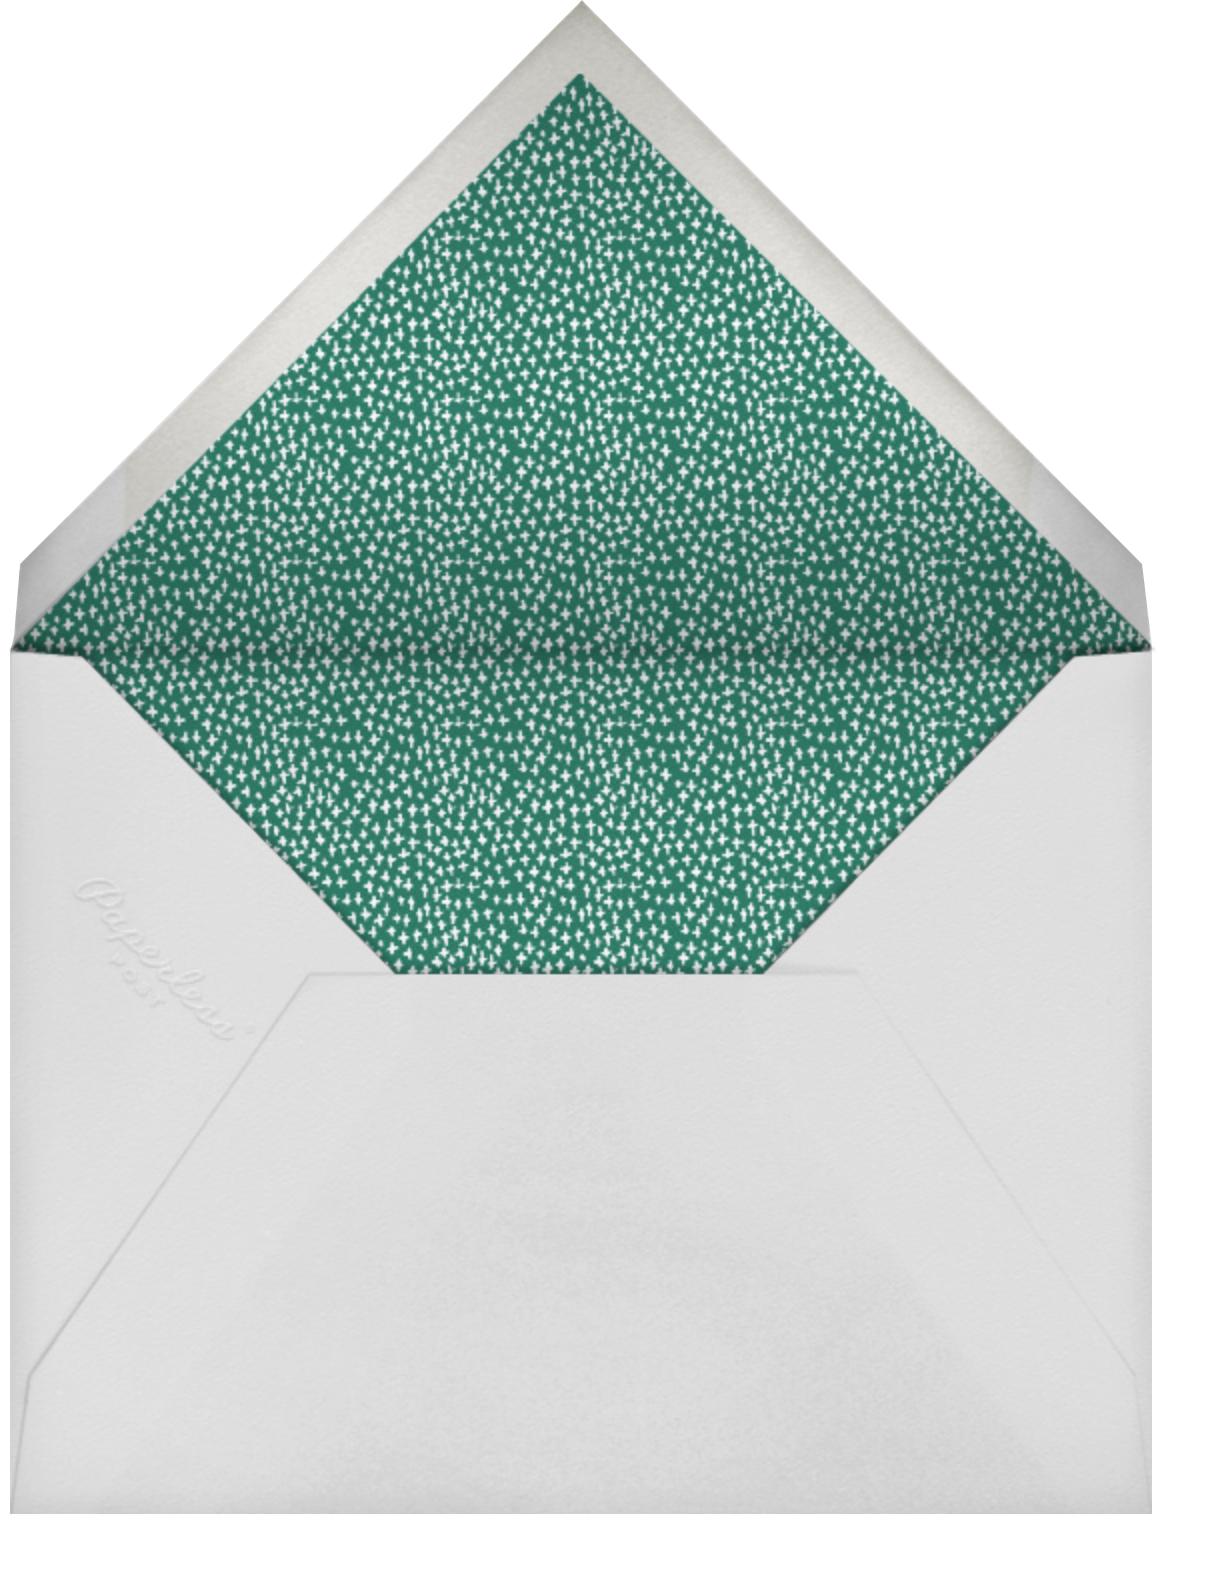 Seasonal Trimmings - Mr. Boddington's Studio - Corporate invitations - envelope back